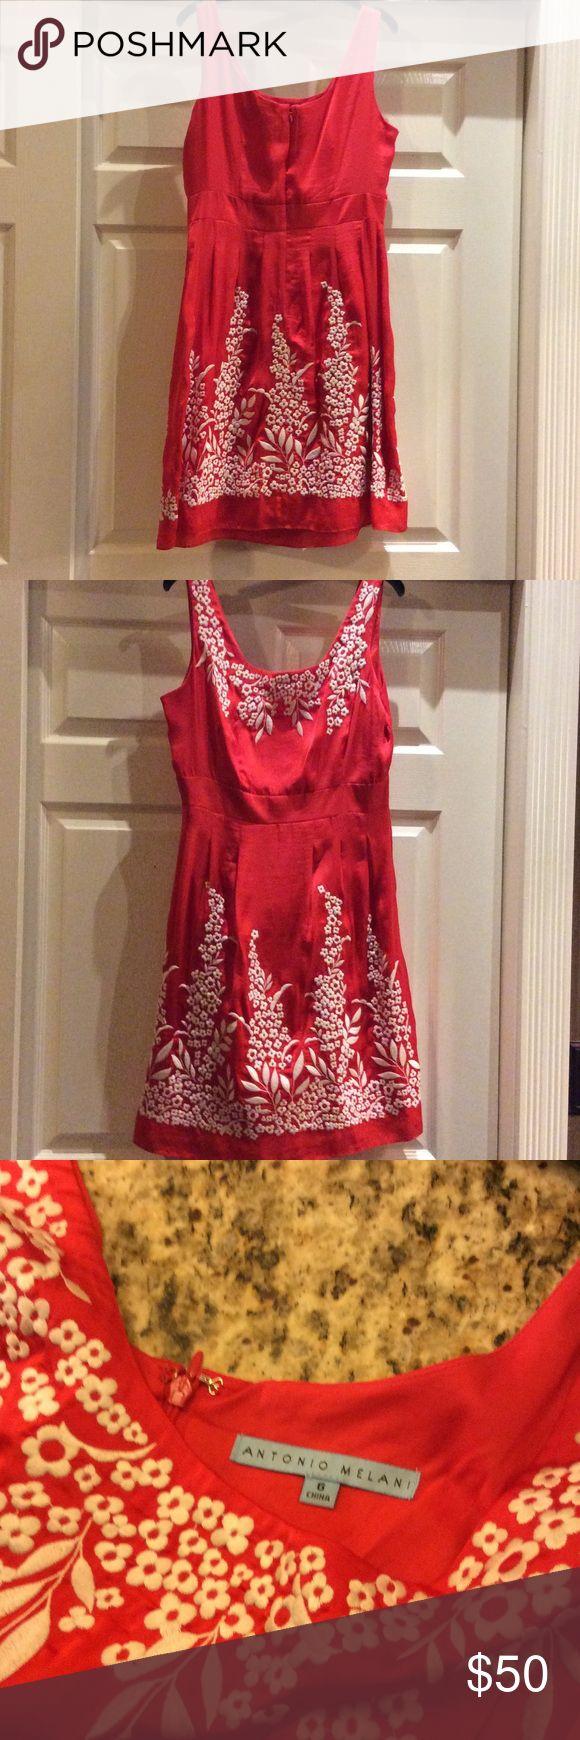 Antonio Melani dress Red with white flowers Antonio Melani dress. ANTONIO MELANI Dresses